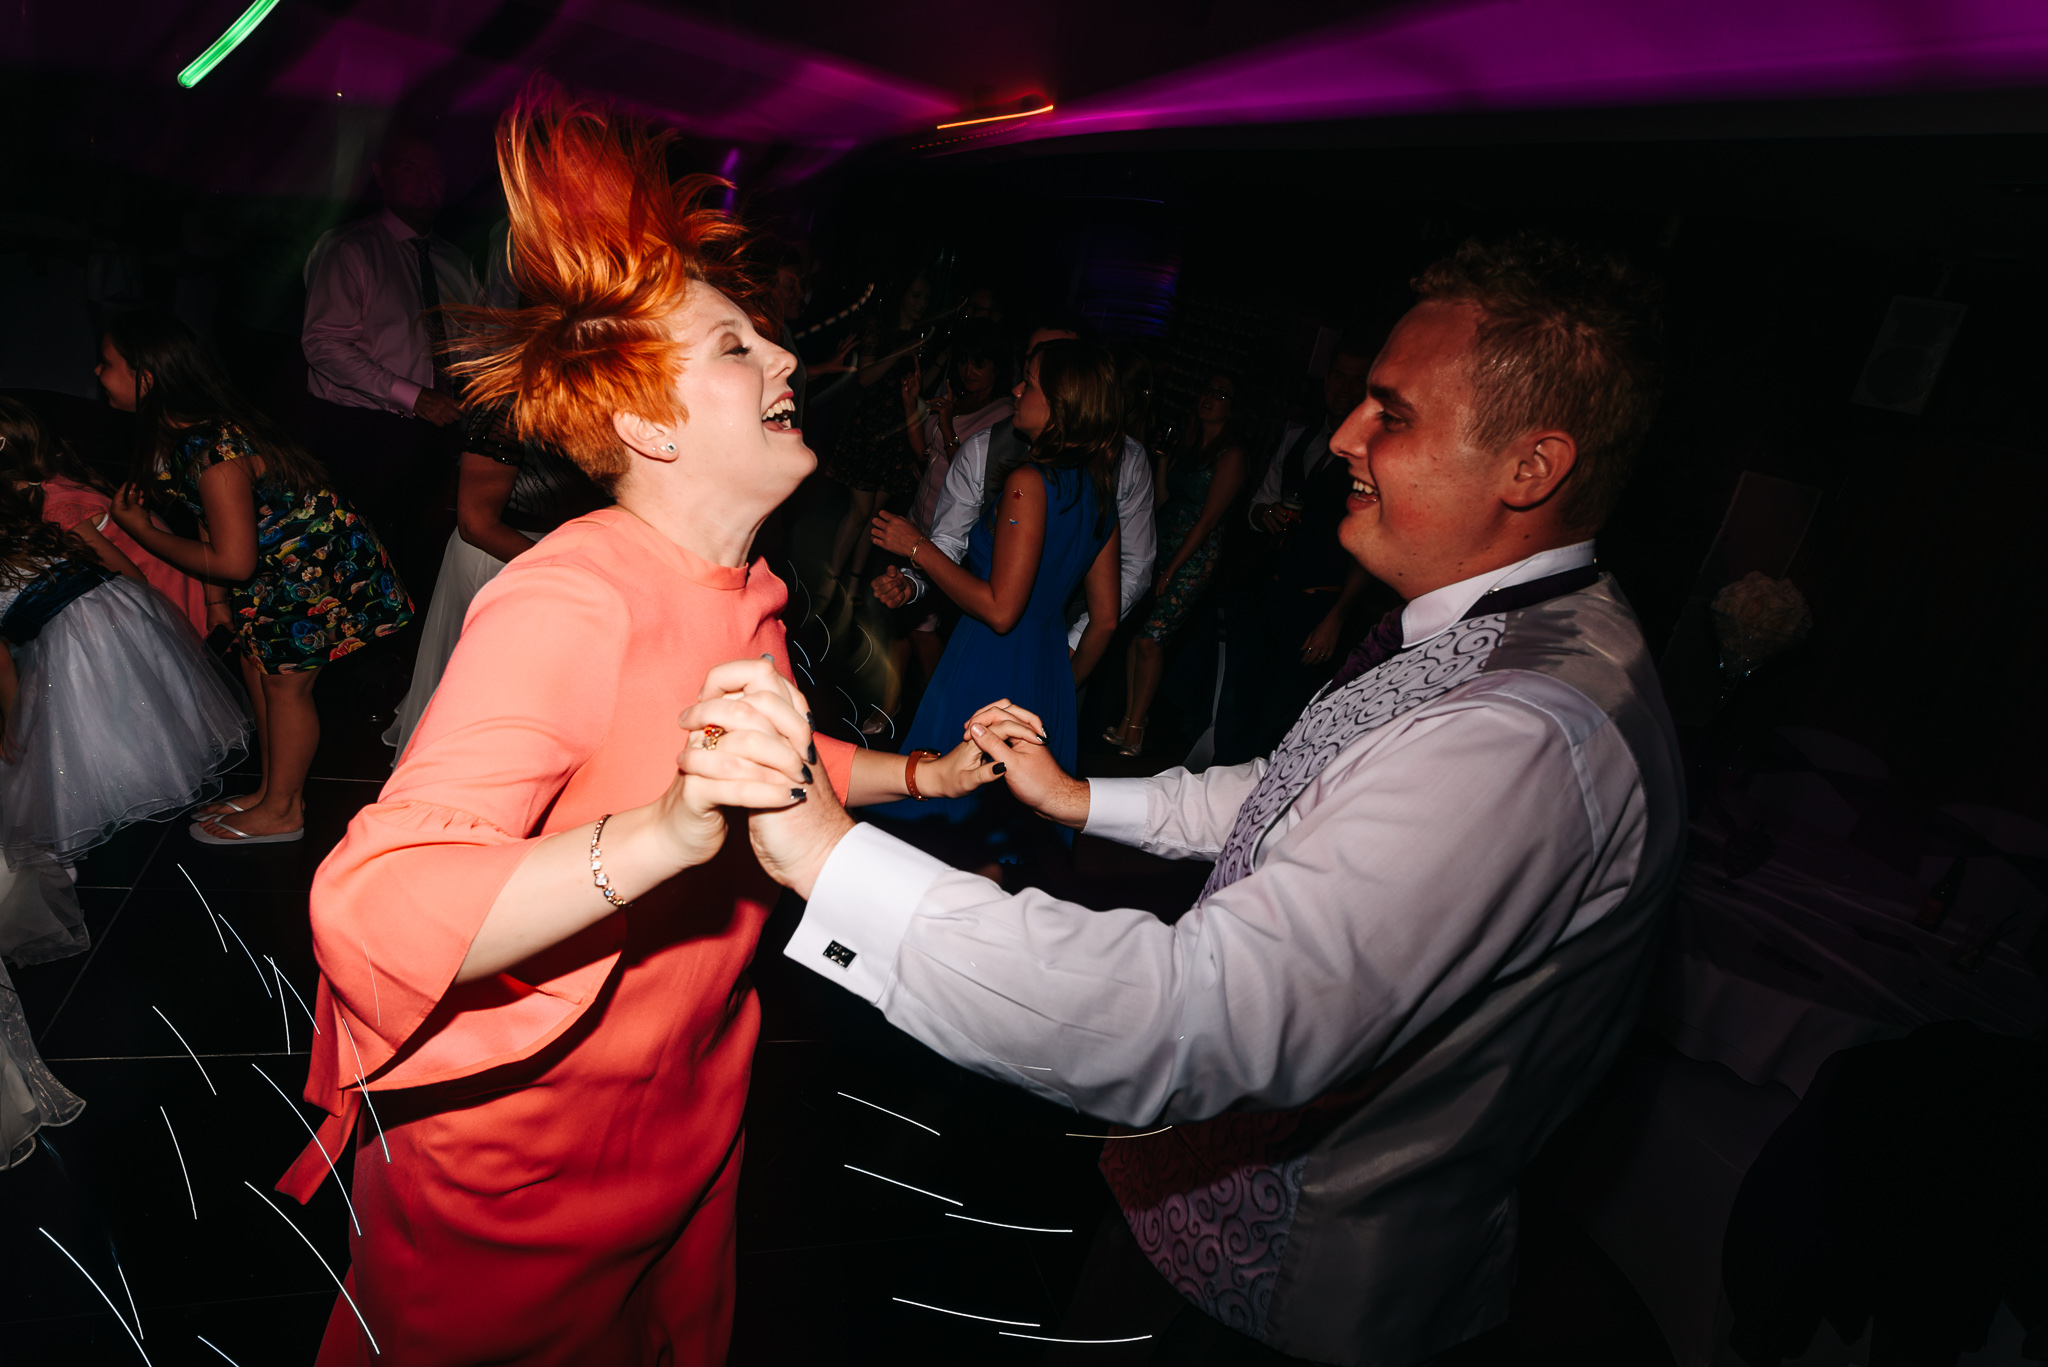 Best Of Yorkshire Wedding Photography 2017 - Martyn Hand-51.jpg